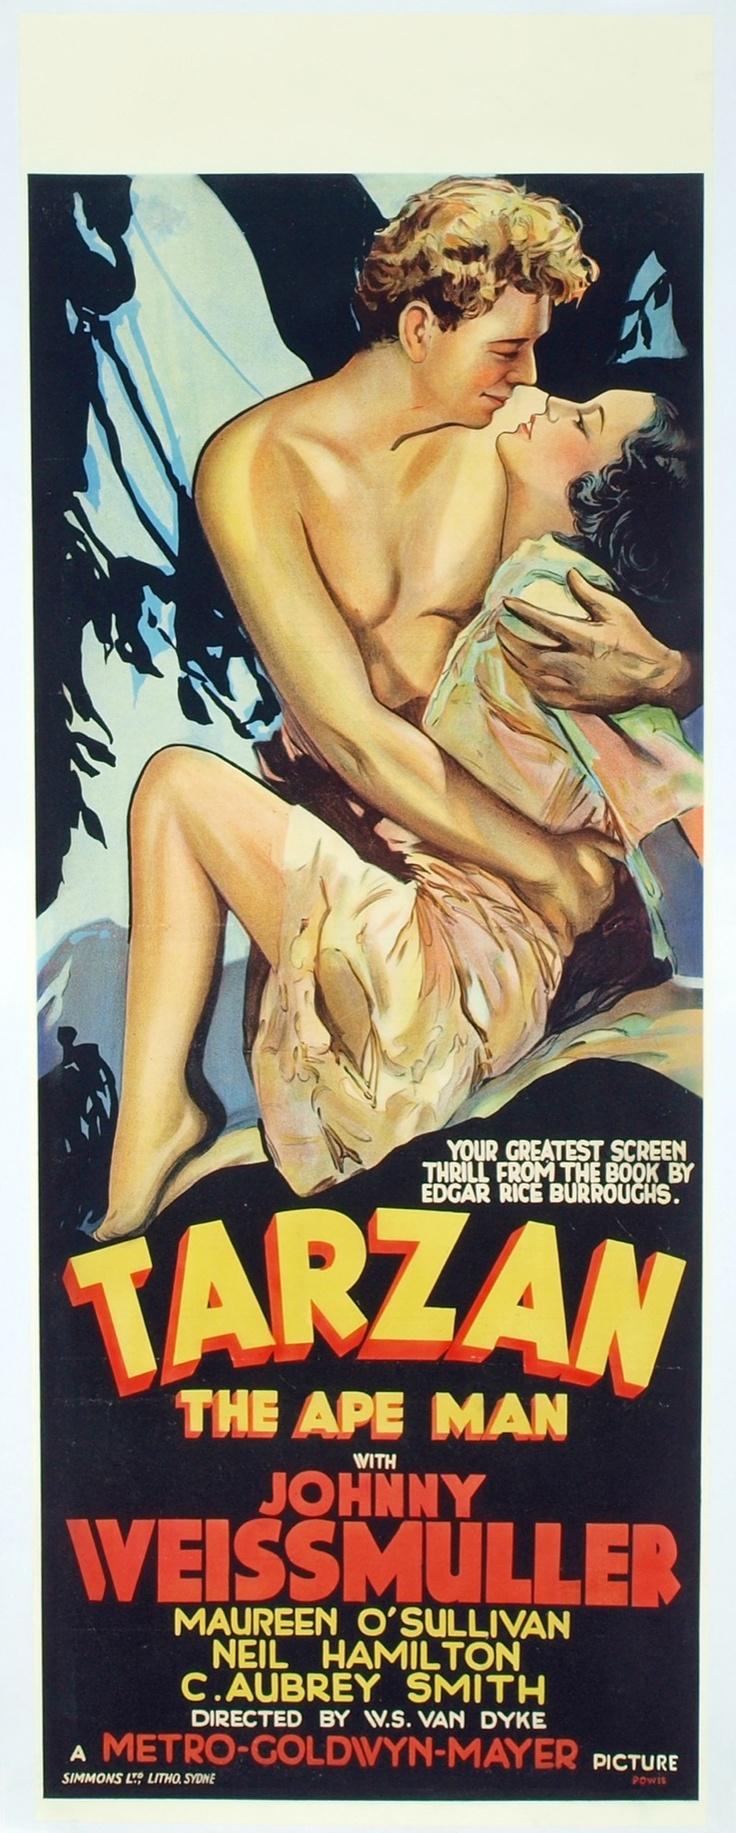 Tarzan the Ape Man, 1932, first of the Johnny Weismuller-Maureen O'Sullivan Tarzan movies.